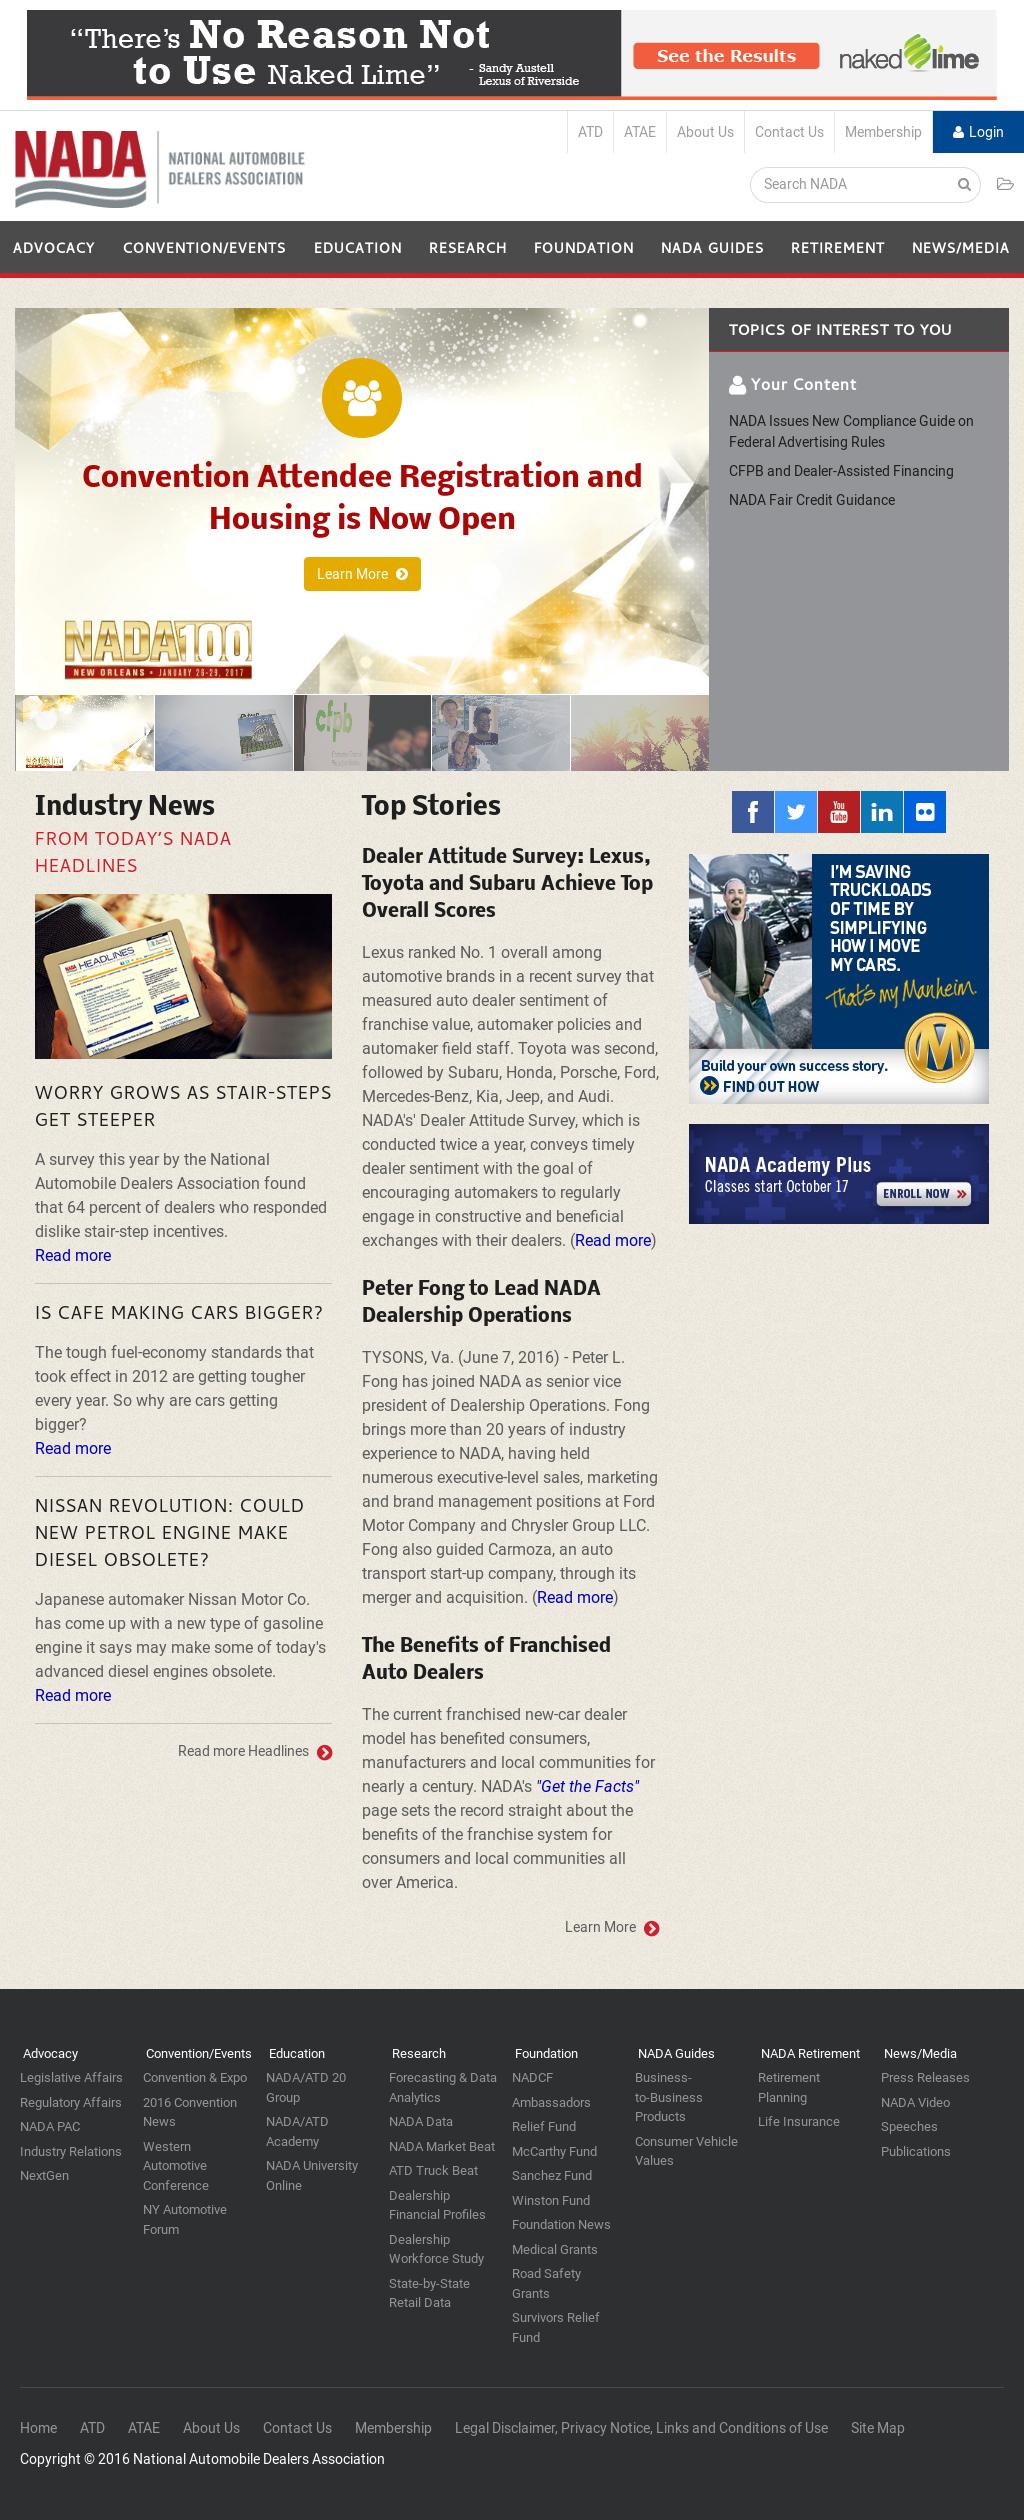 NADA Competitors, Revenue and Employees - Owler Company Profile